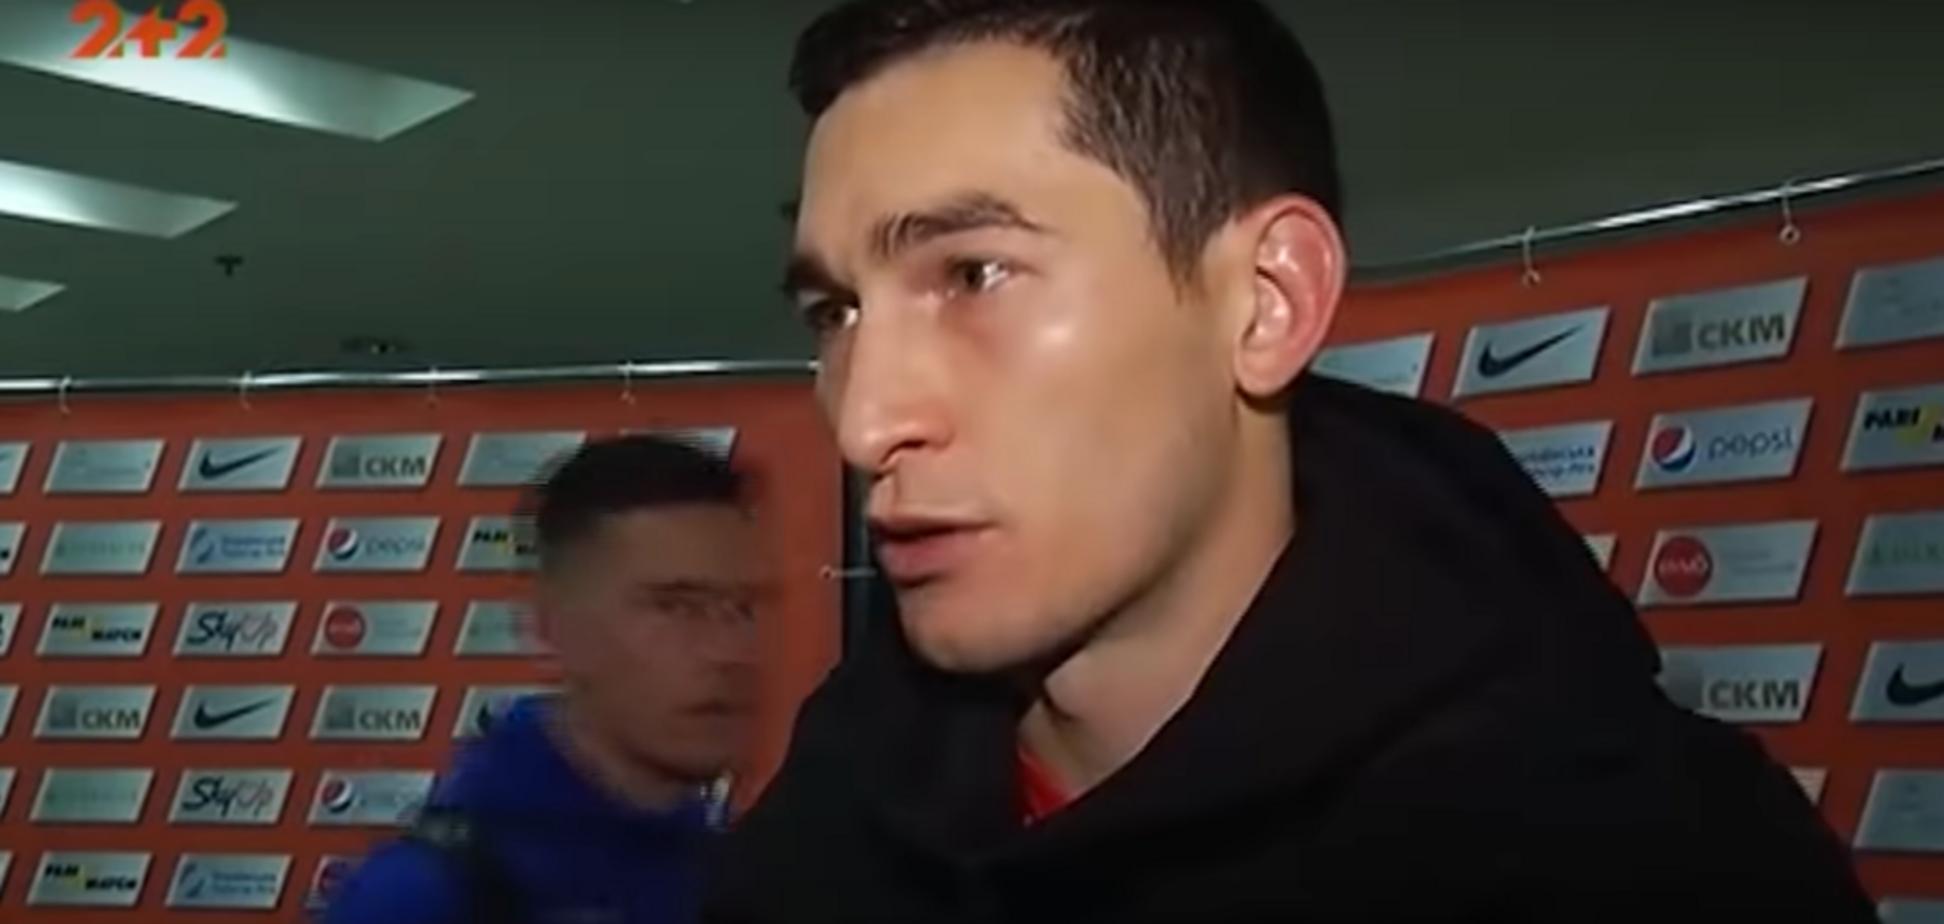 ''Спасибо за красную'': между Степаненко и Кендзерой произошел инцидент